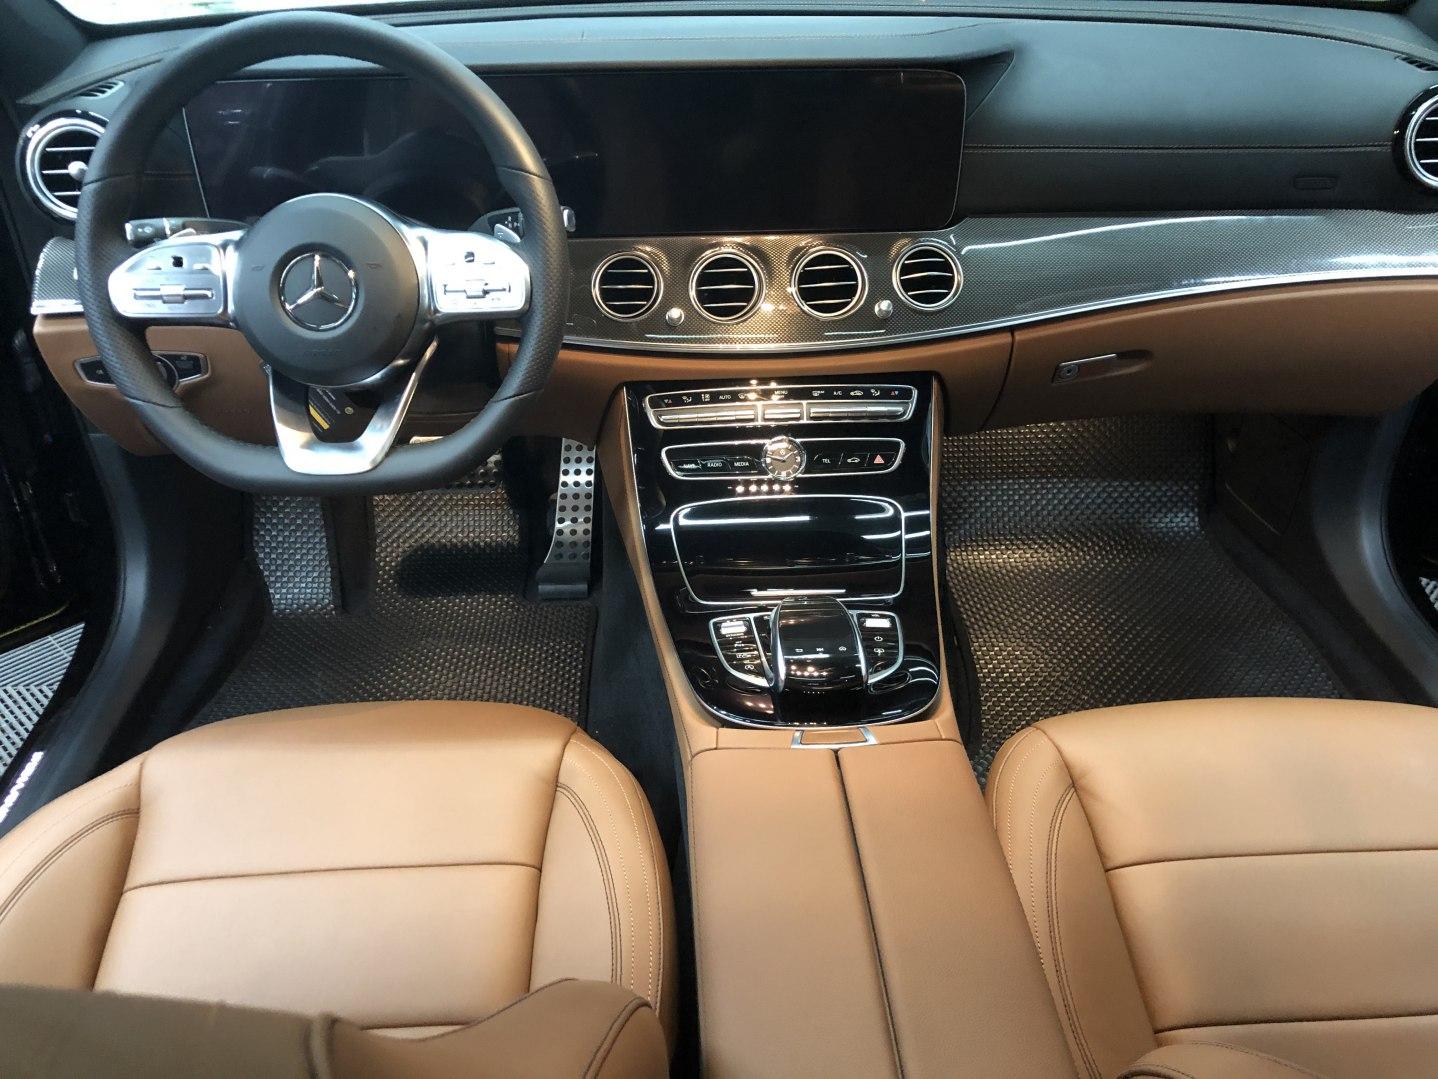 Thảm lót sàn Mercedes E Class W213